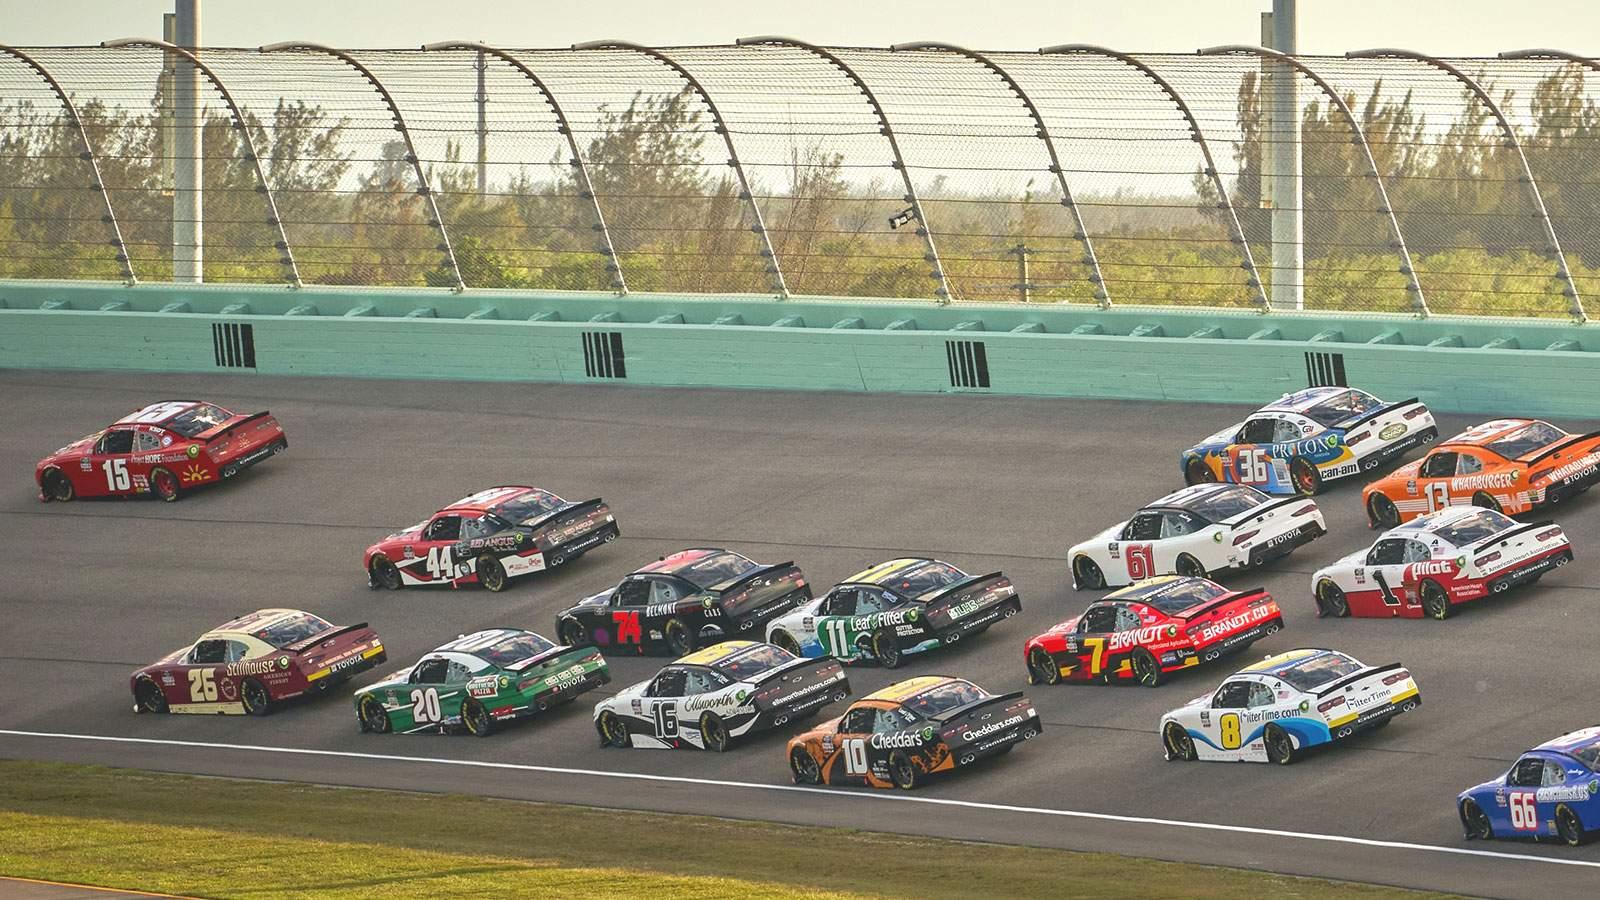 NASCAR Cup Series - Hollywood Casino 400 (Reduced Capacity, Social Distancing)